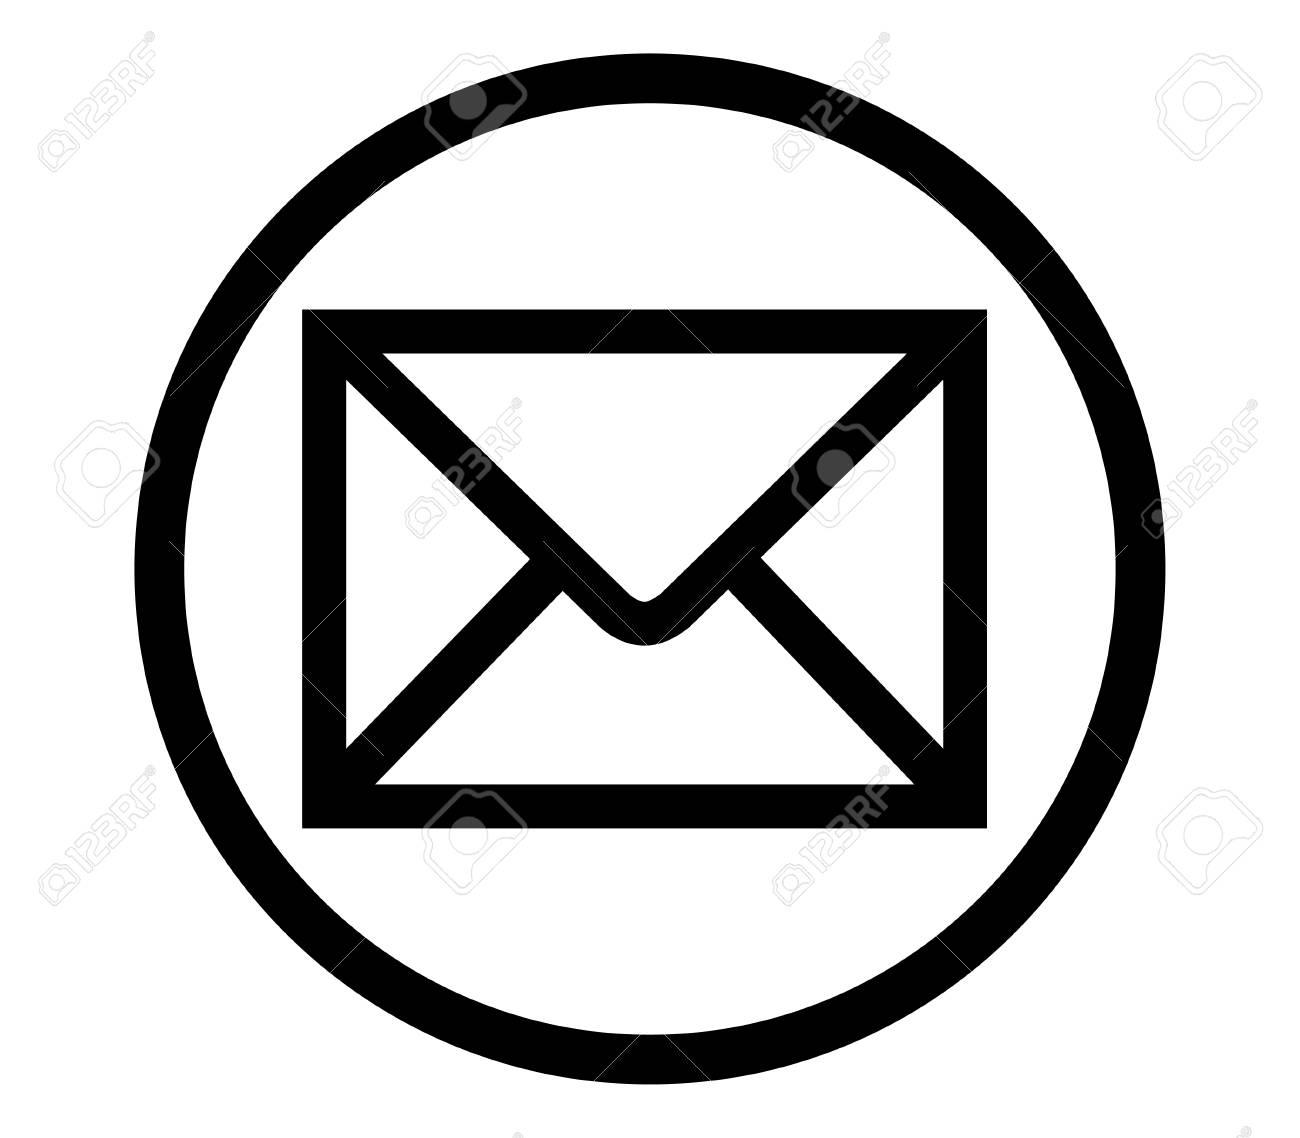 e posta ikon ile ilgili görsel sonucu